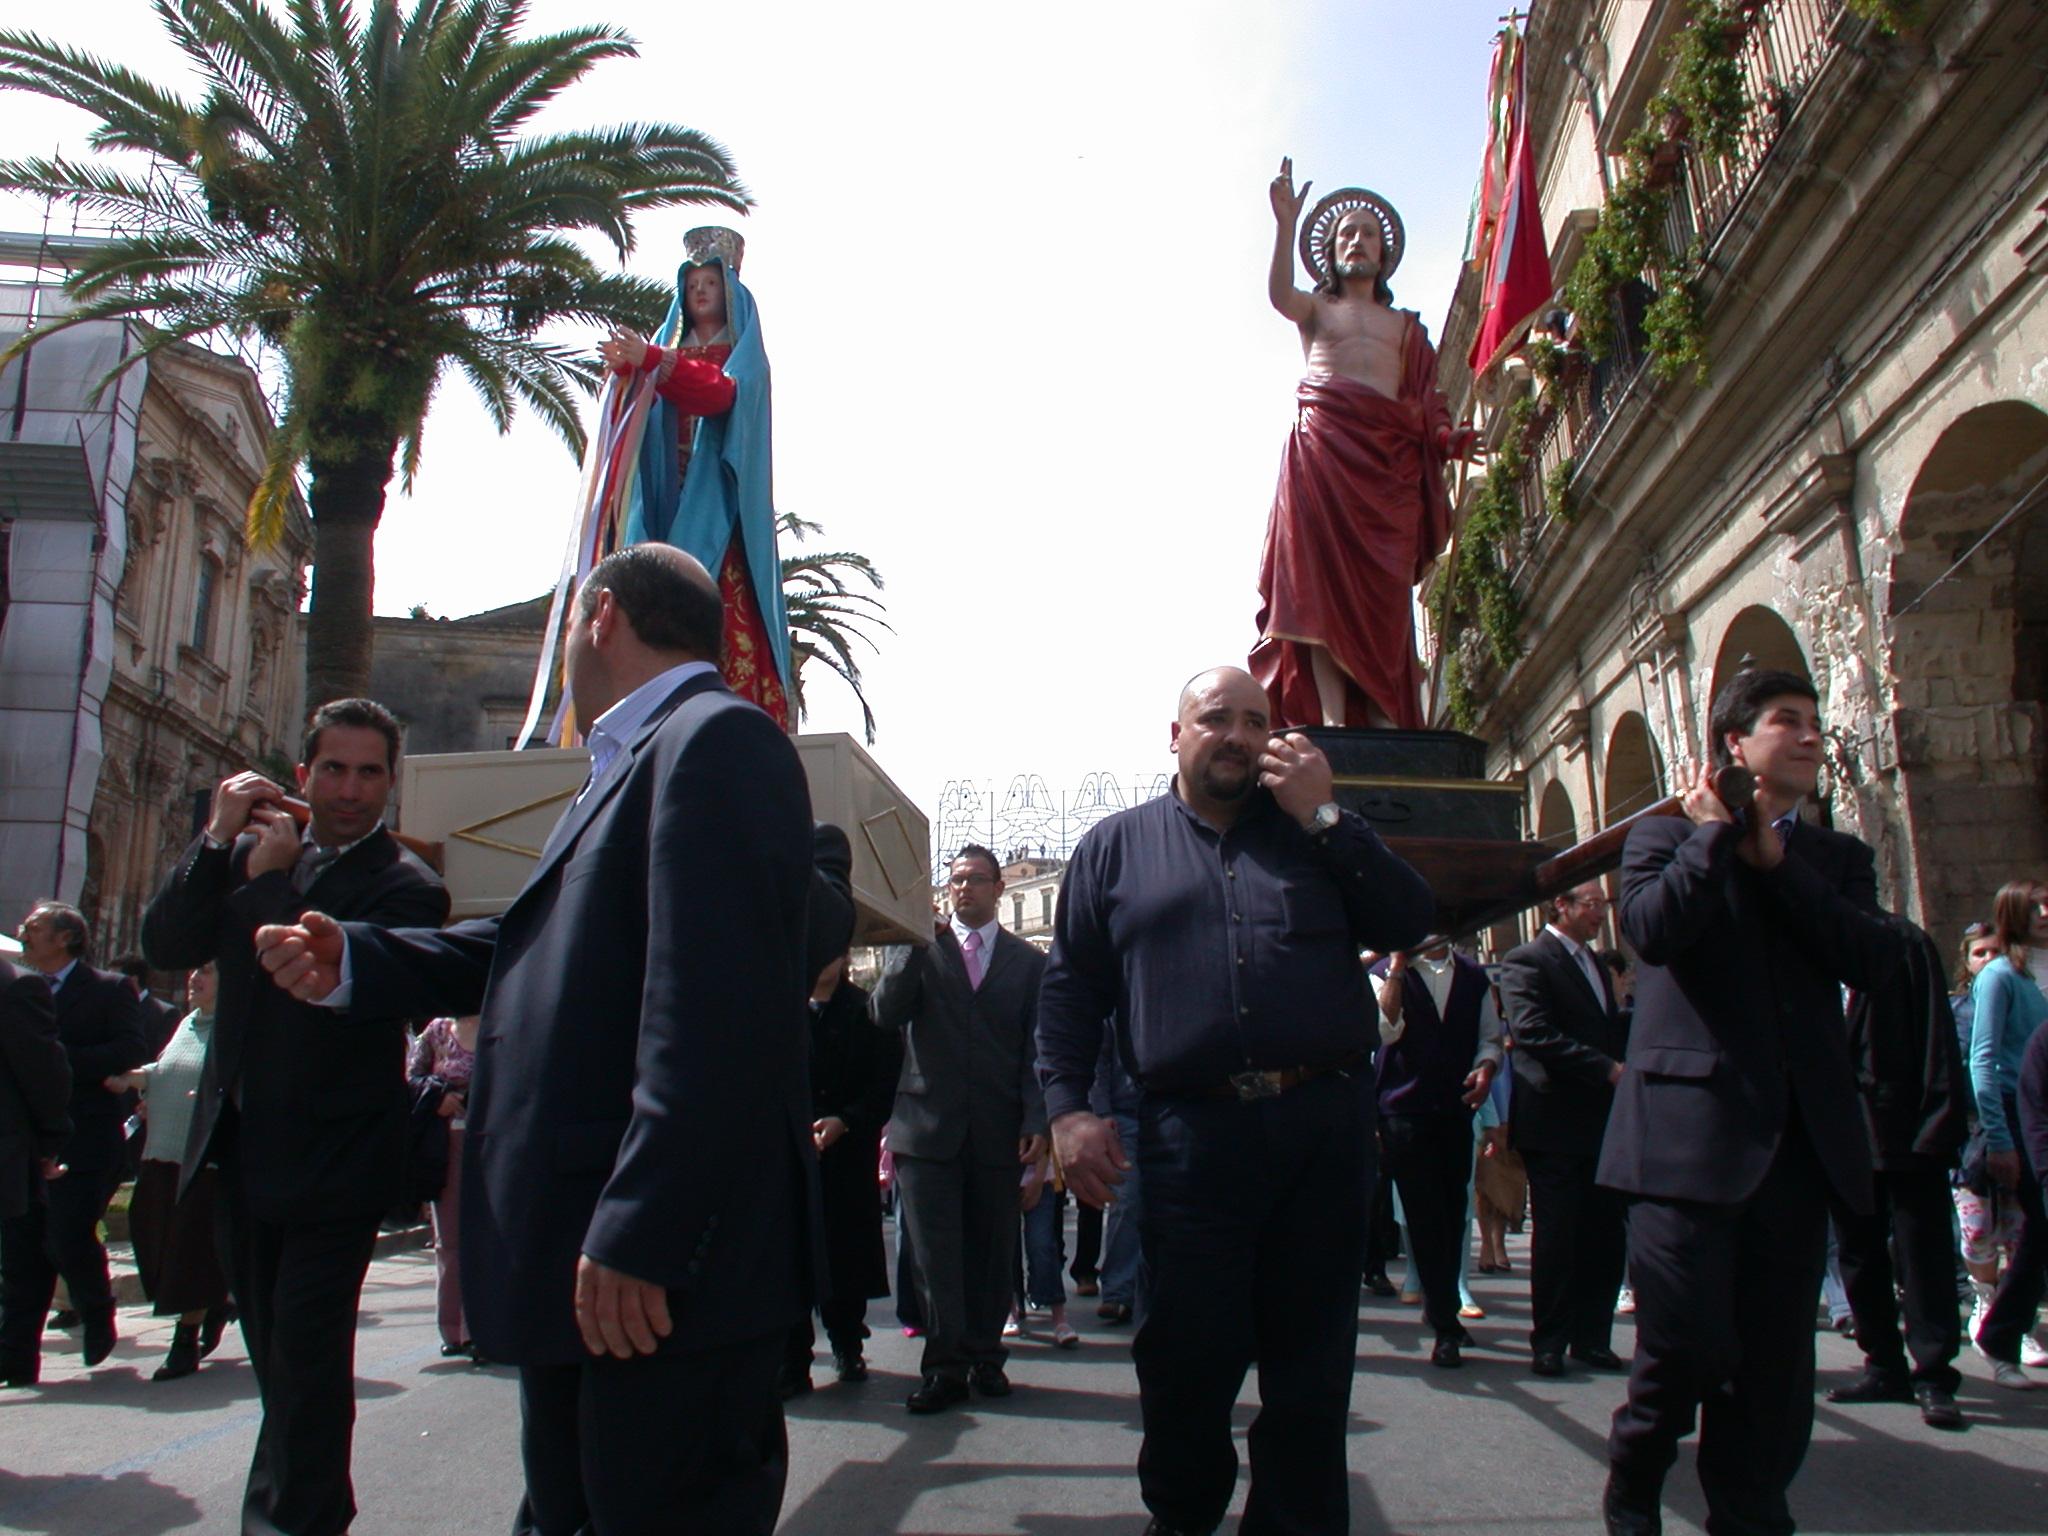 Luca Errera, Daniela Trastulli, Sicilia, Modica, Maronna vasa vasa, Vasa, vasa